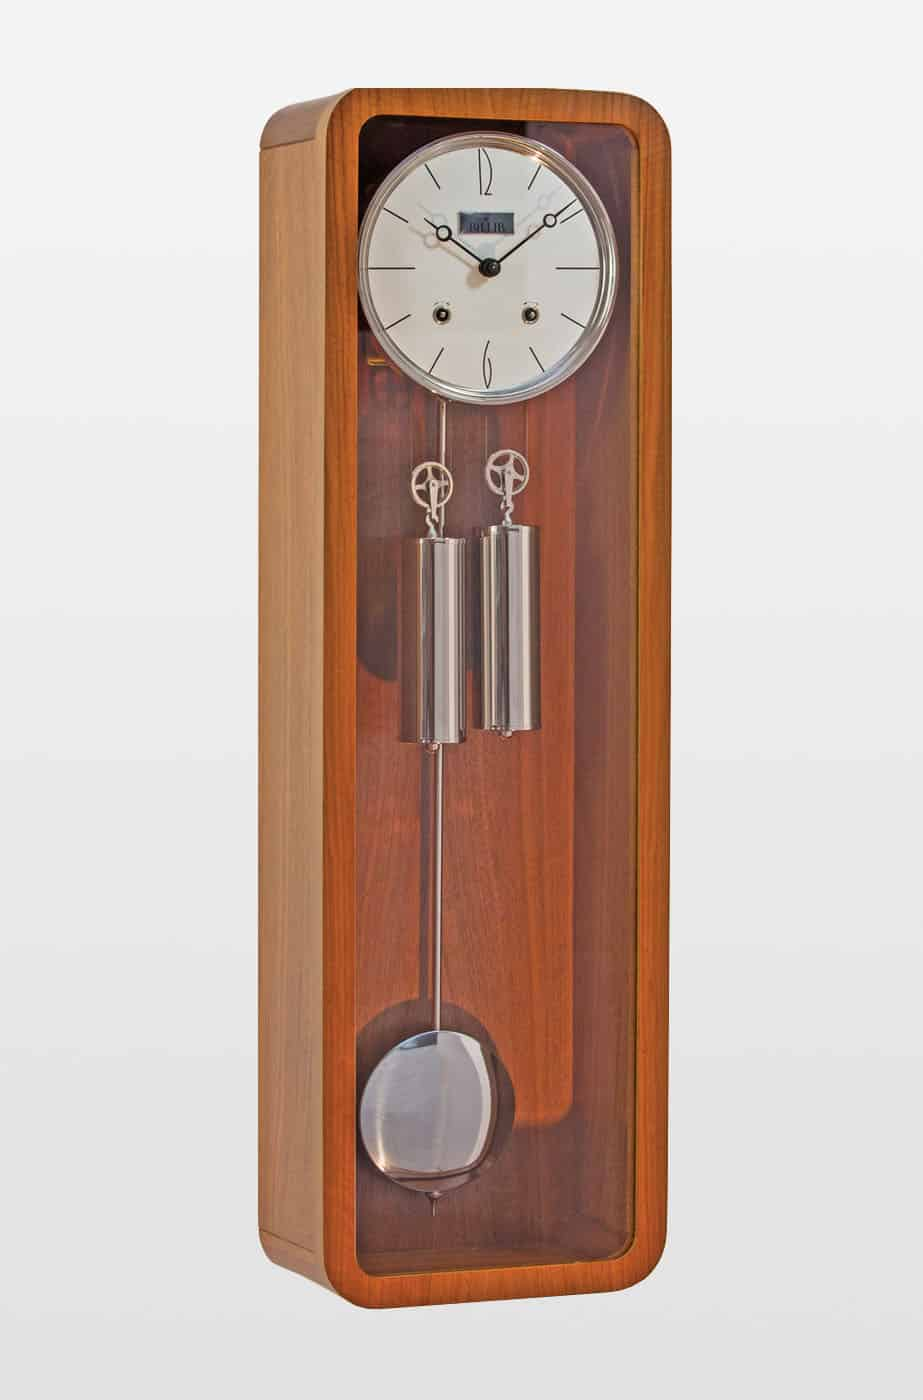 Vintage Mechanical Wall Clock in Teak Finish